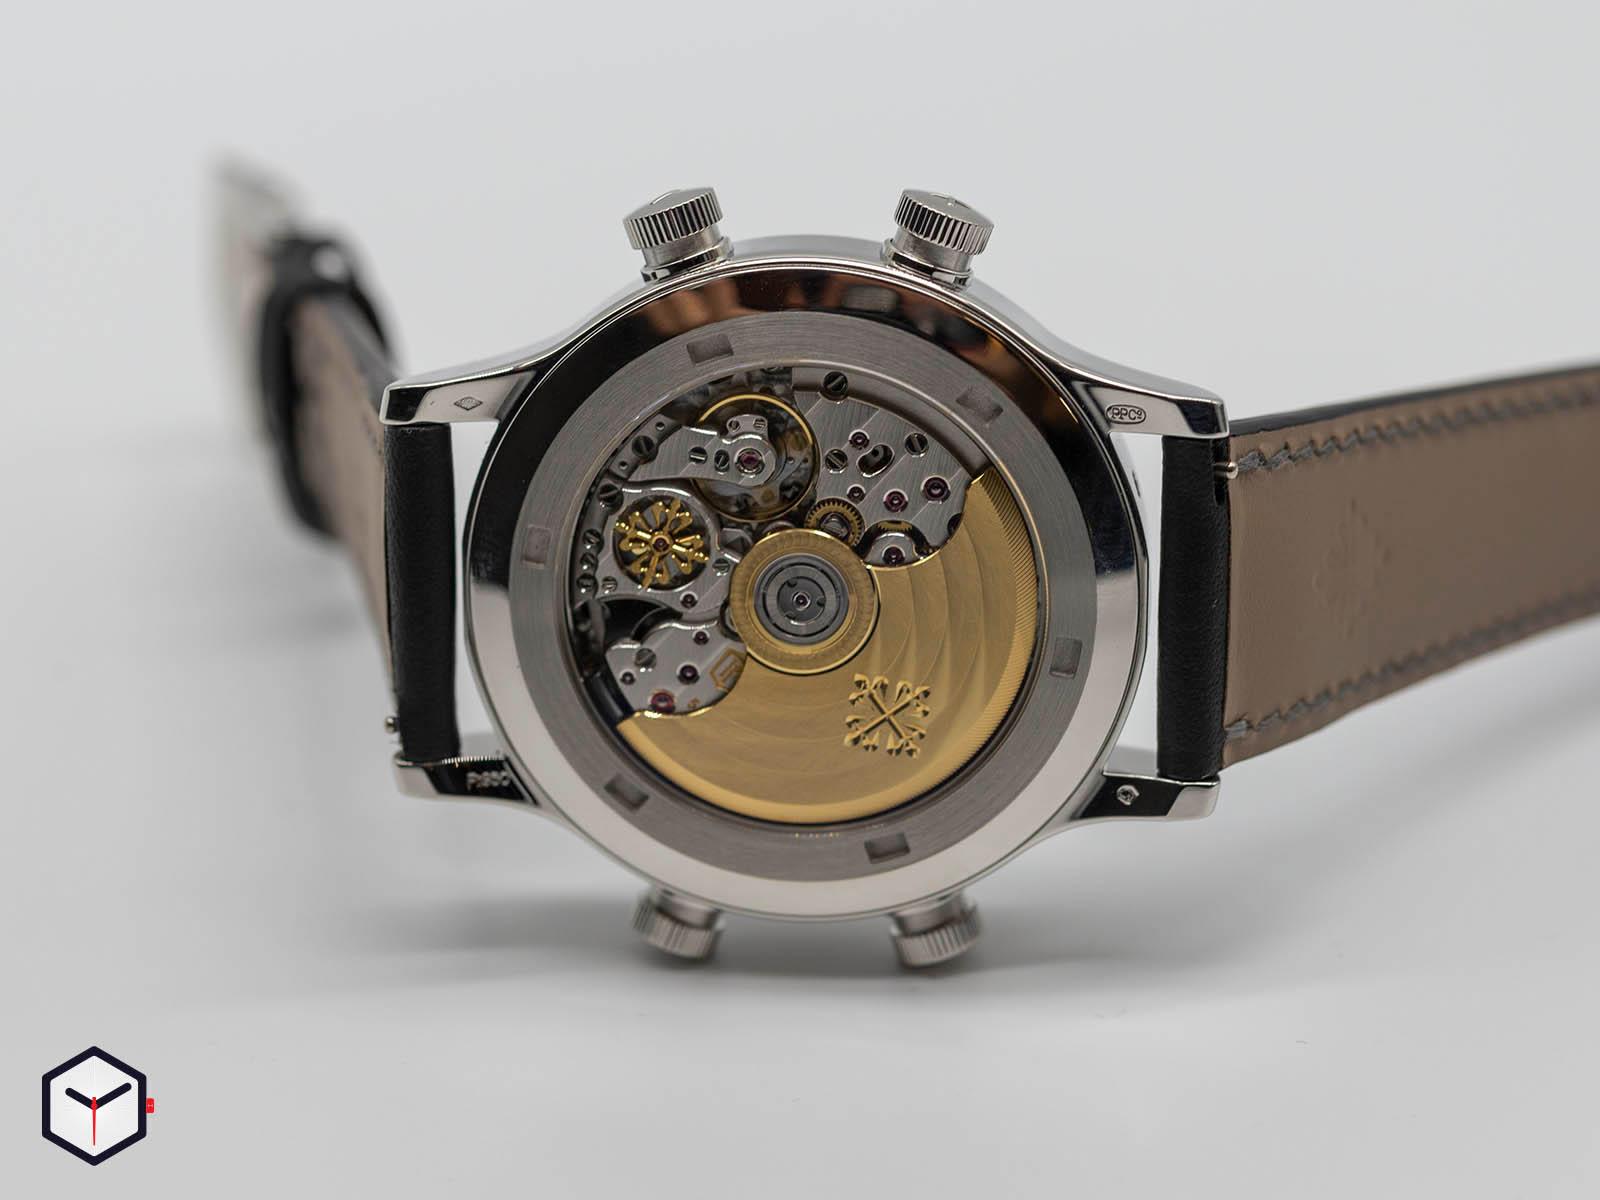 mechanical-alarm-watches-patek-philippe-5520p-3.jpg